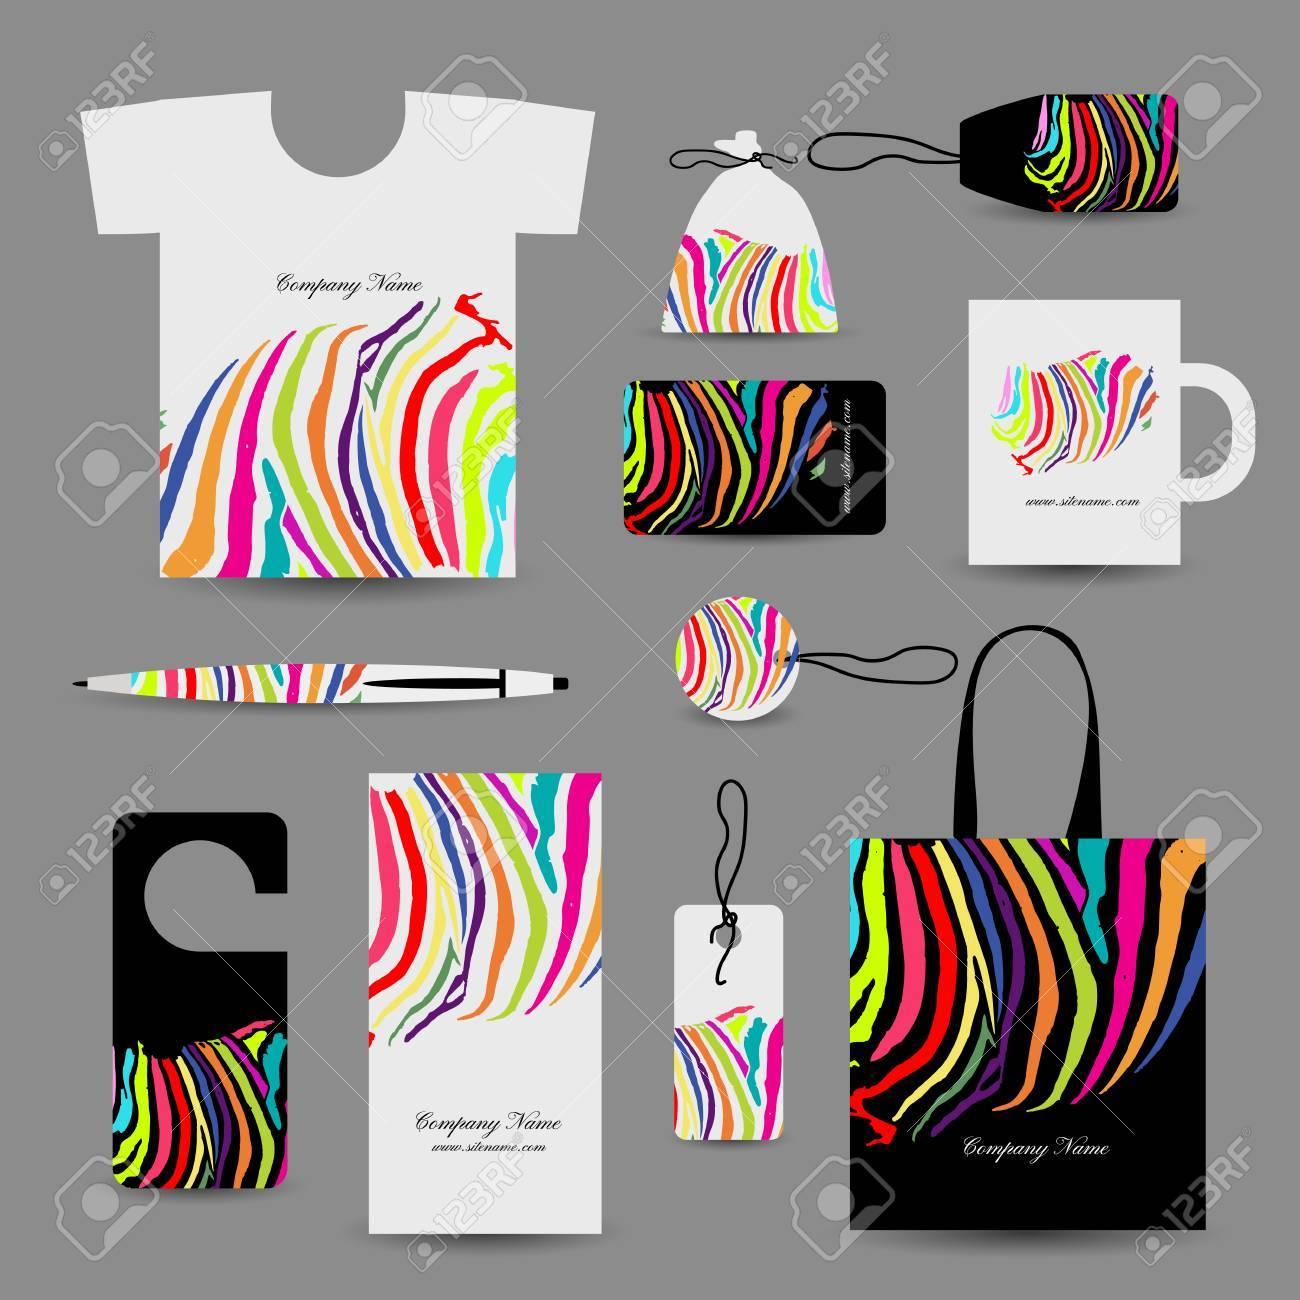 Corporate Business Cards, Colorful Zebra Print Design. Vector ...